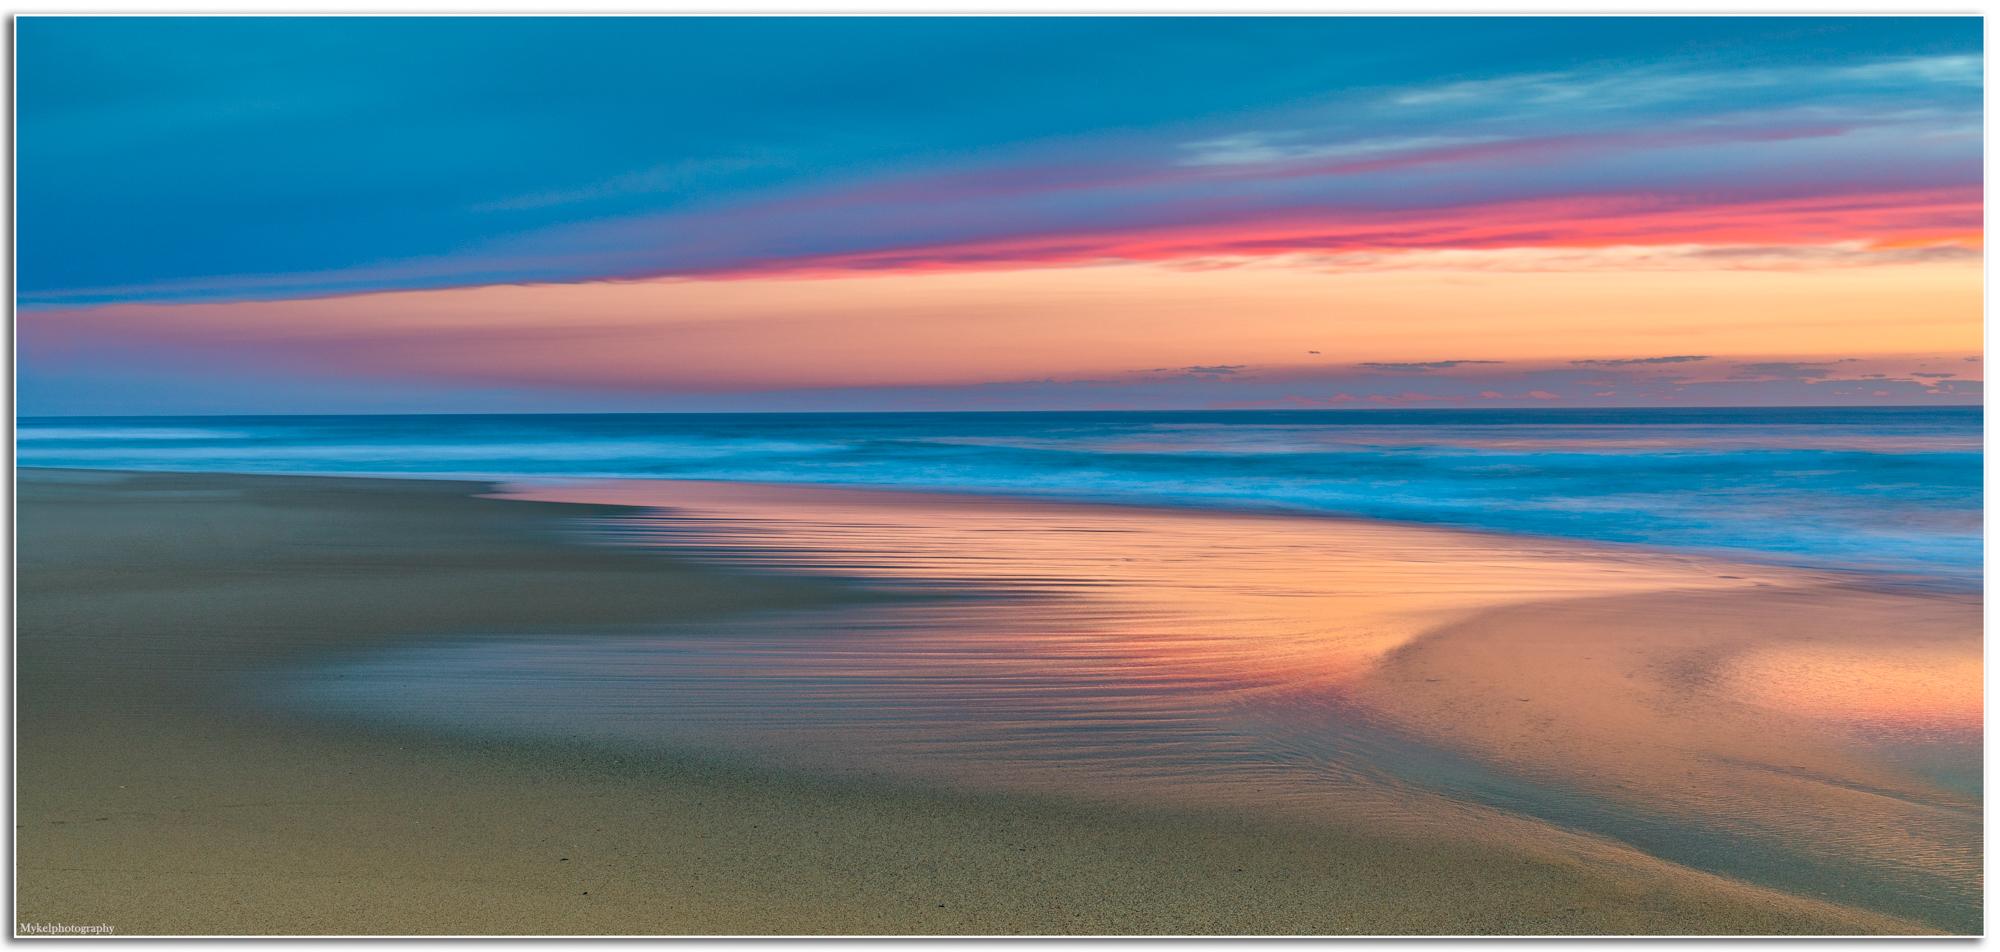 Stunning Pastel sunsets